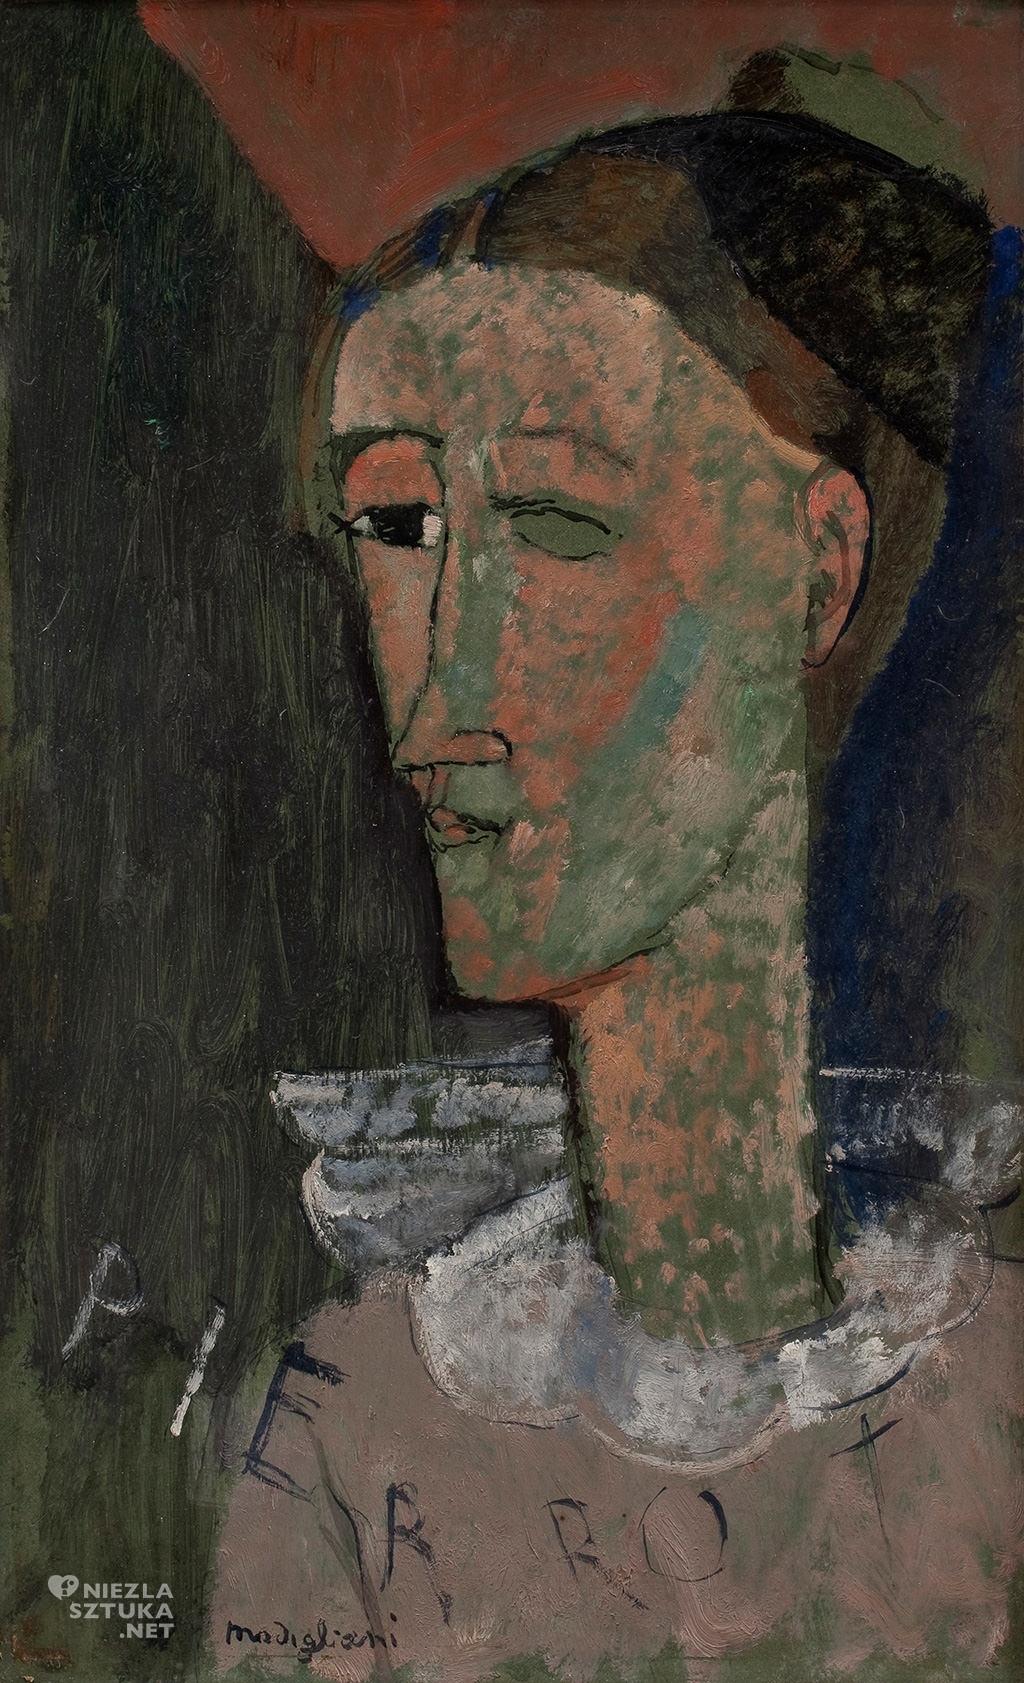 Amedeo Modigliani, Autoportret jako Pierrot, malarstwo olejne, autoportret, sztuka włoska, sztuka nowoczesna, Ecole de Paris, Niezła Sztuka